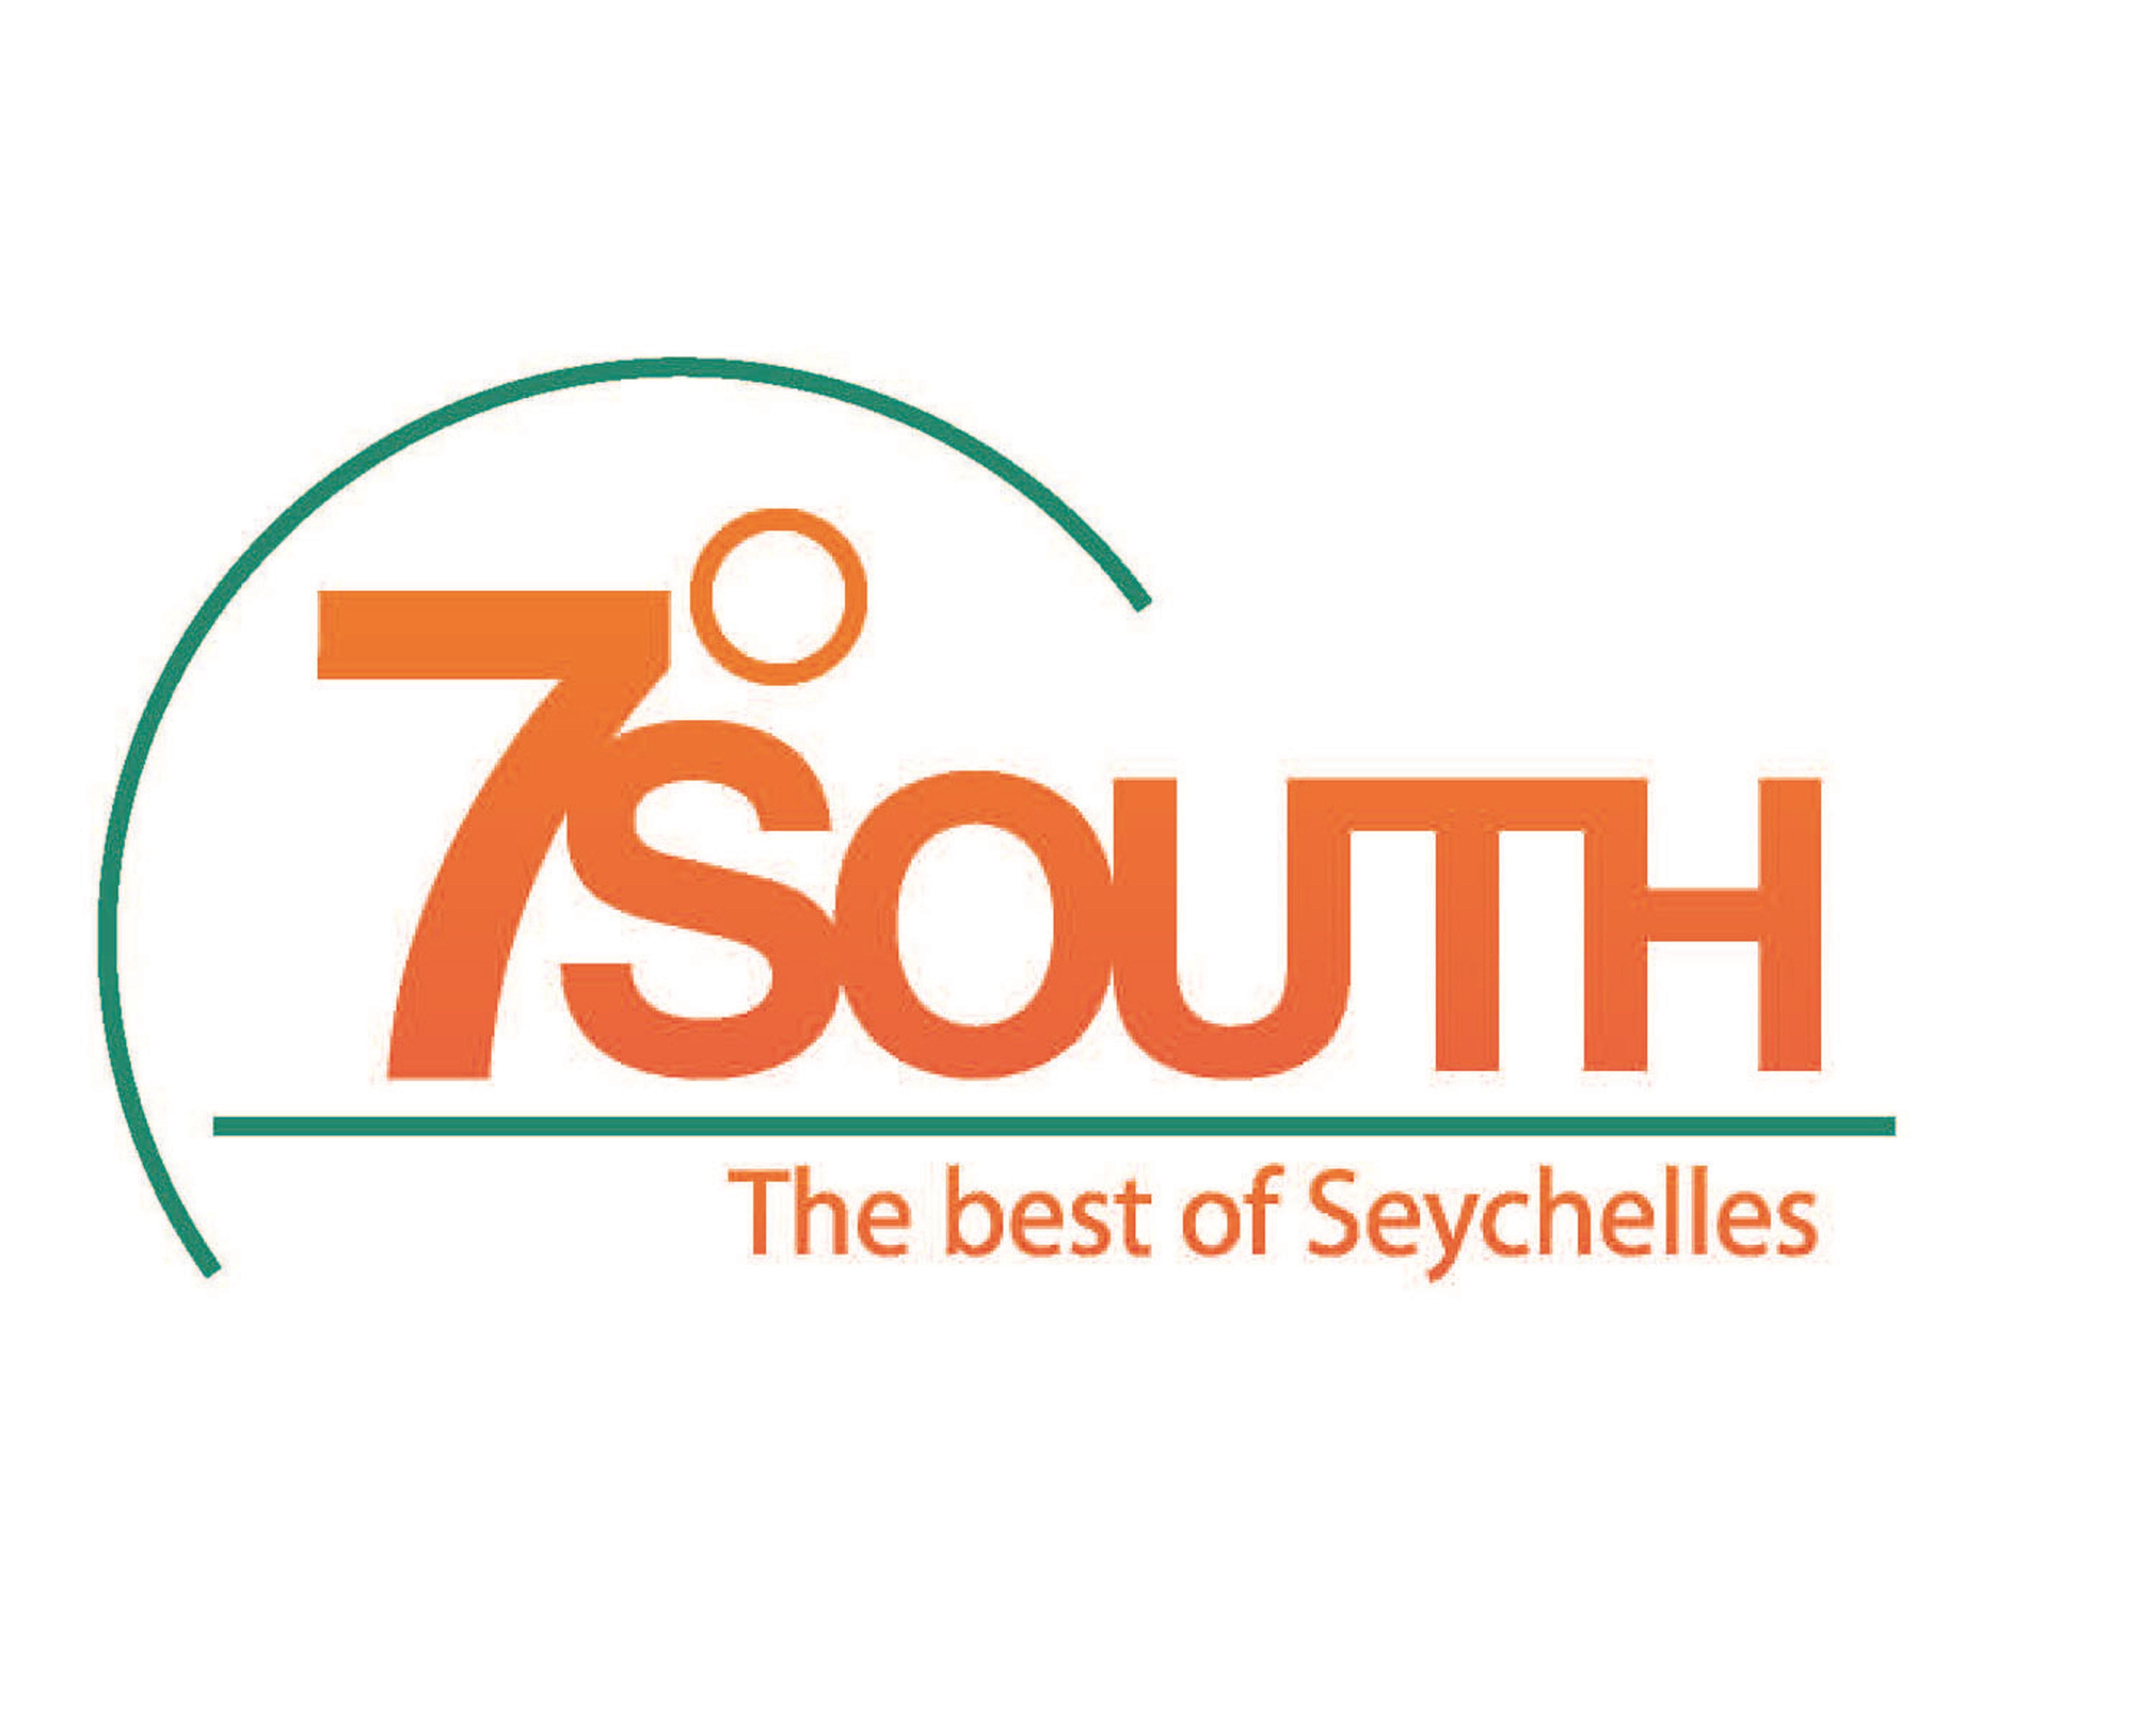 7 South